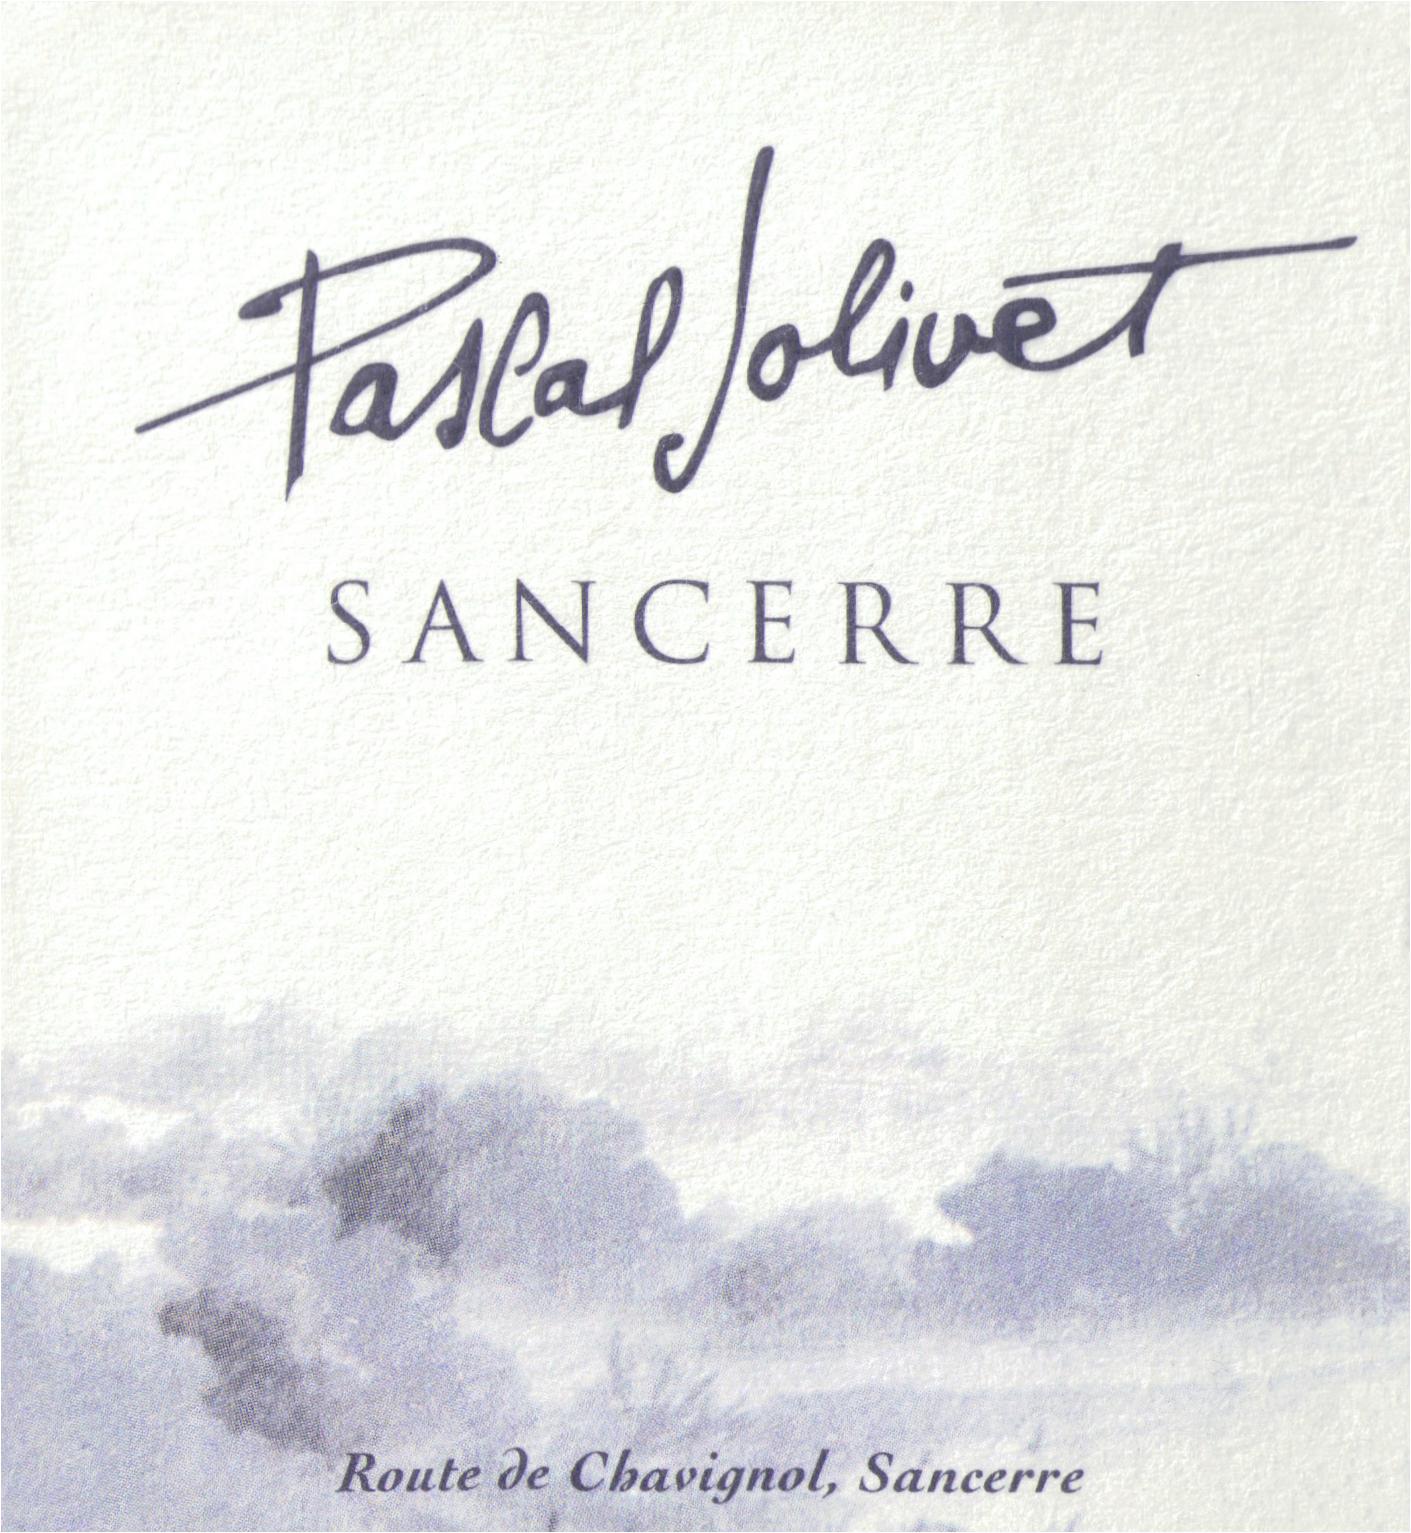 Pascal Jolivet Sancerre 2018